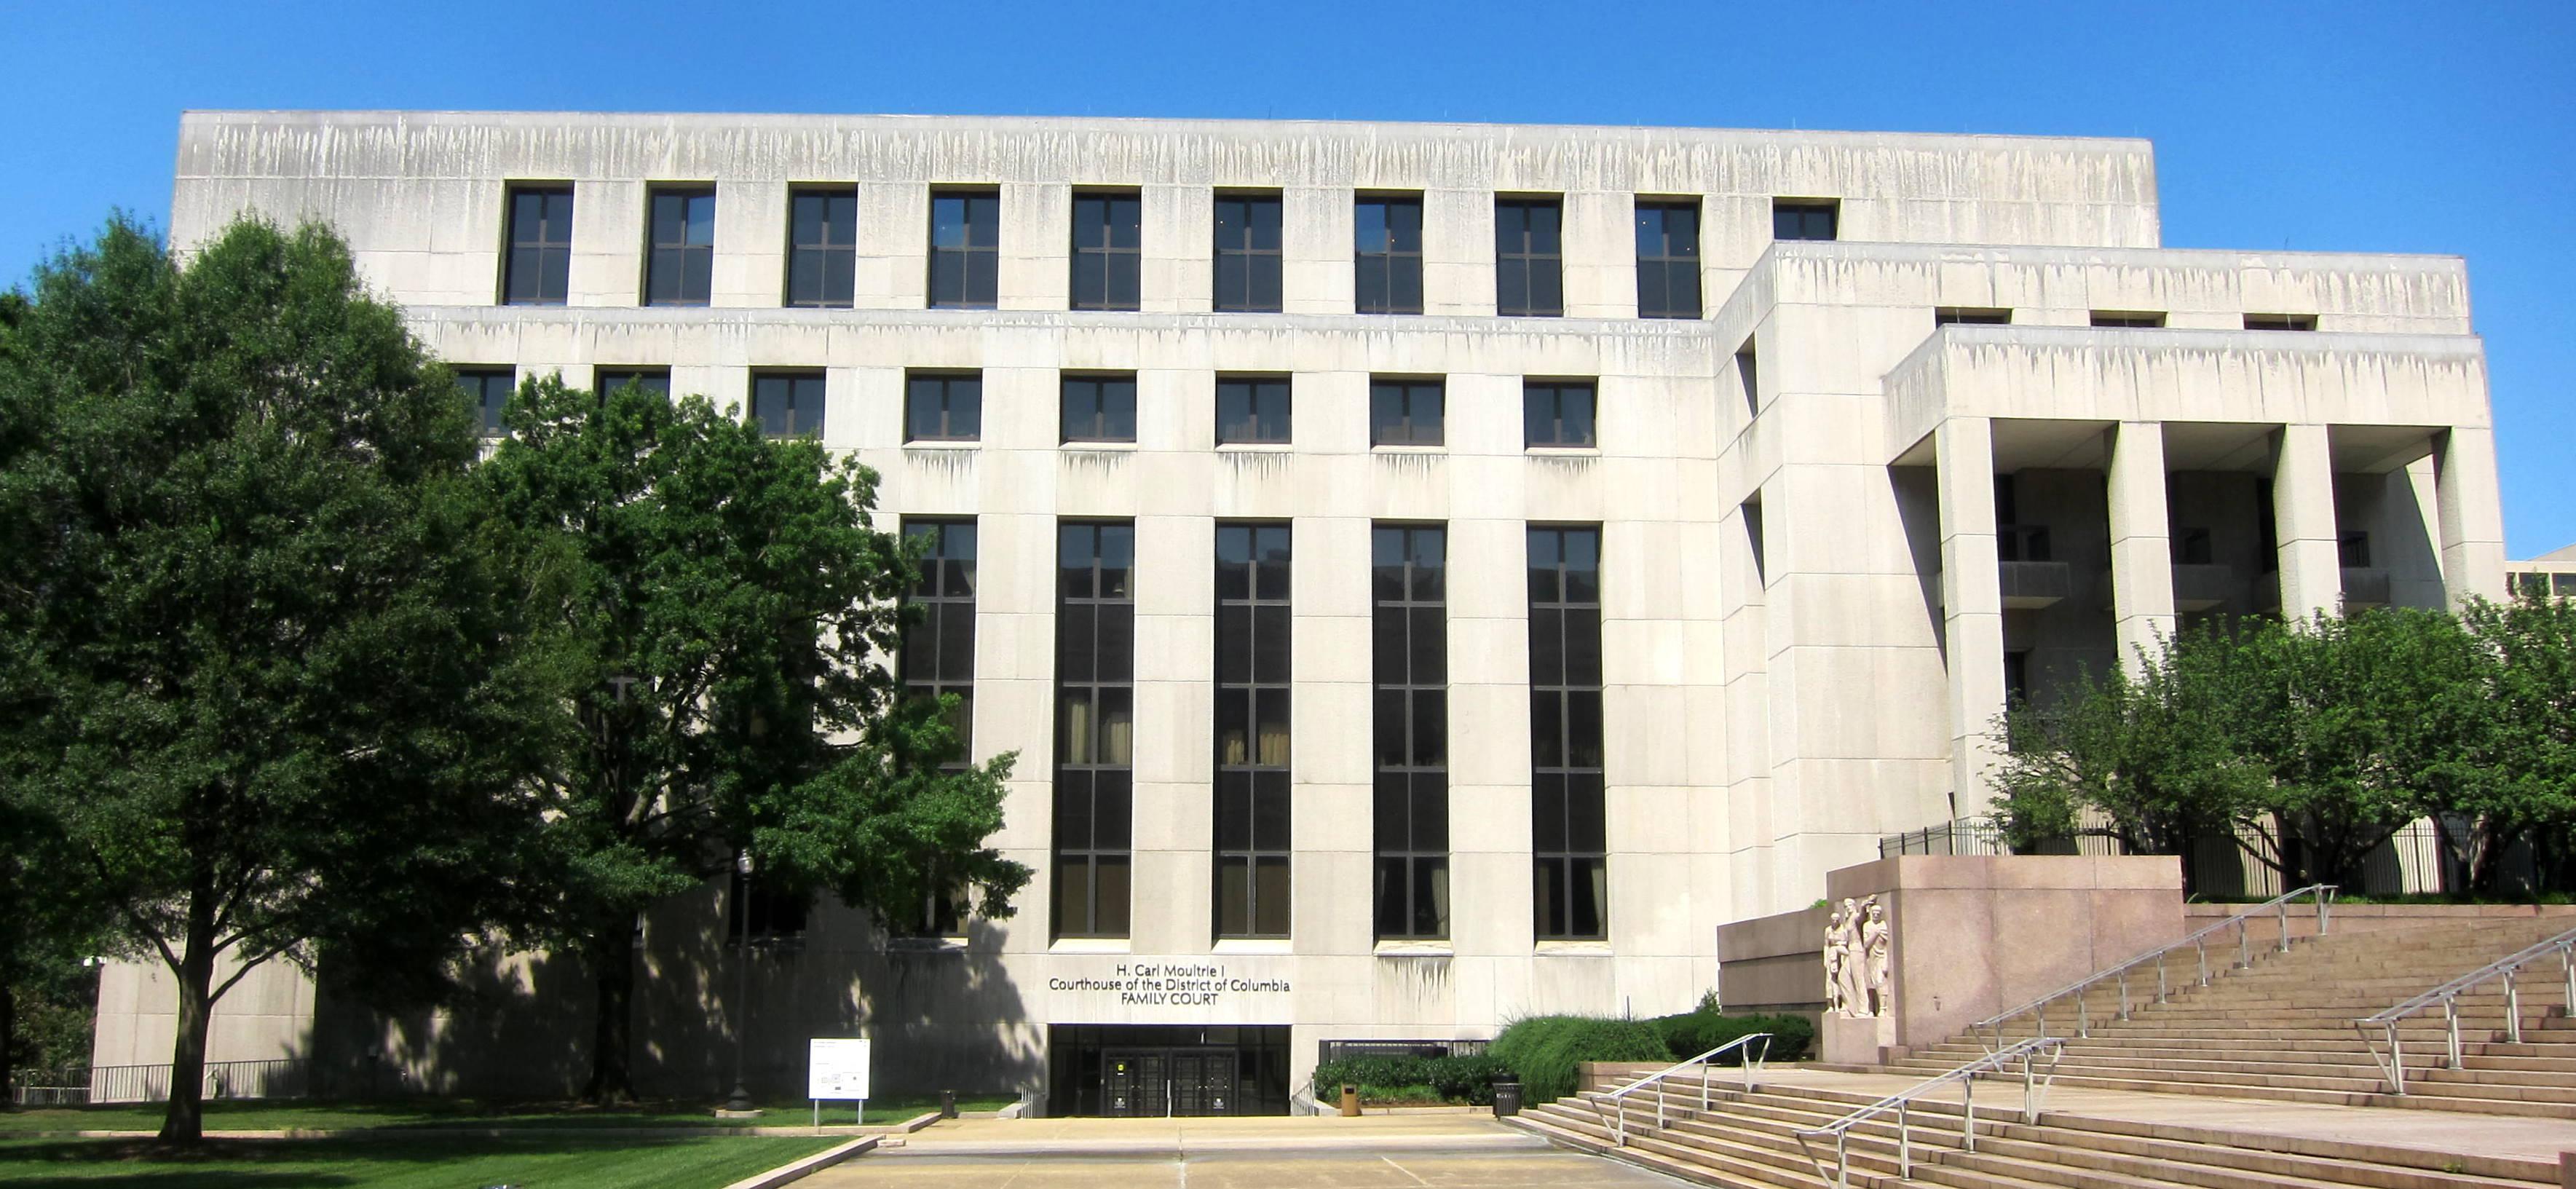 DC judge dismisses defamation suit against former British spy